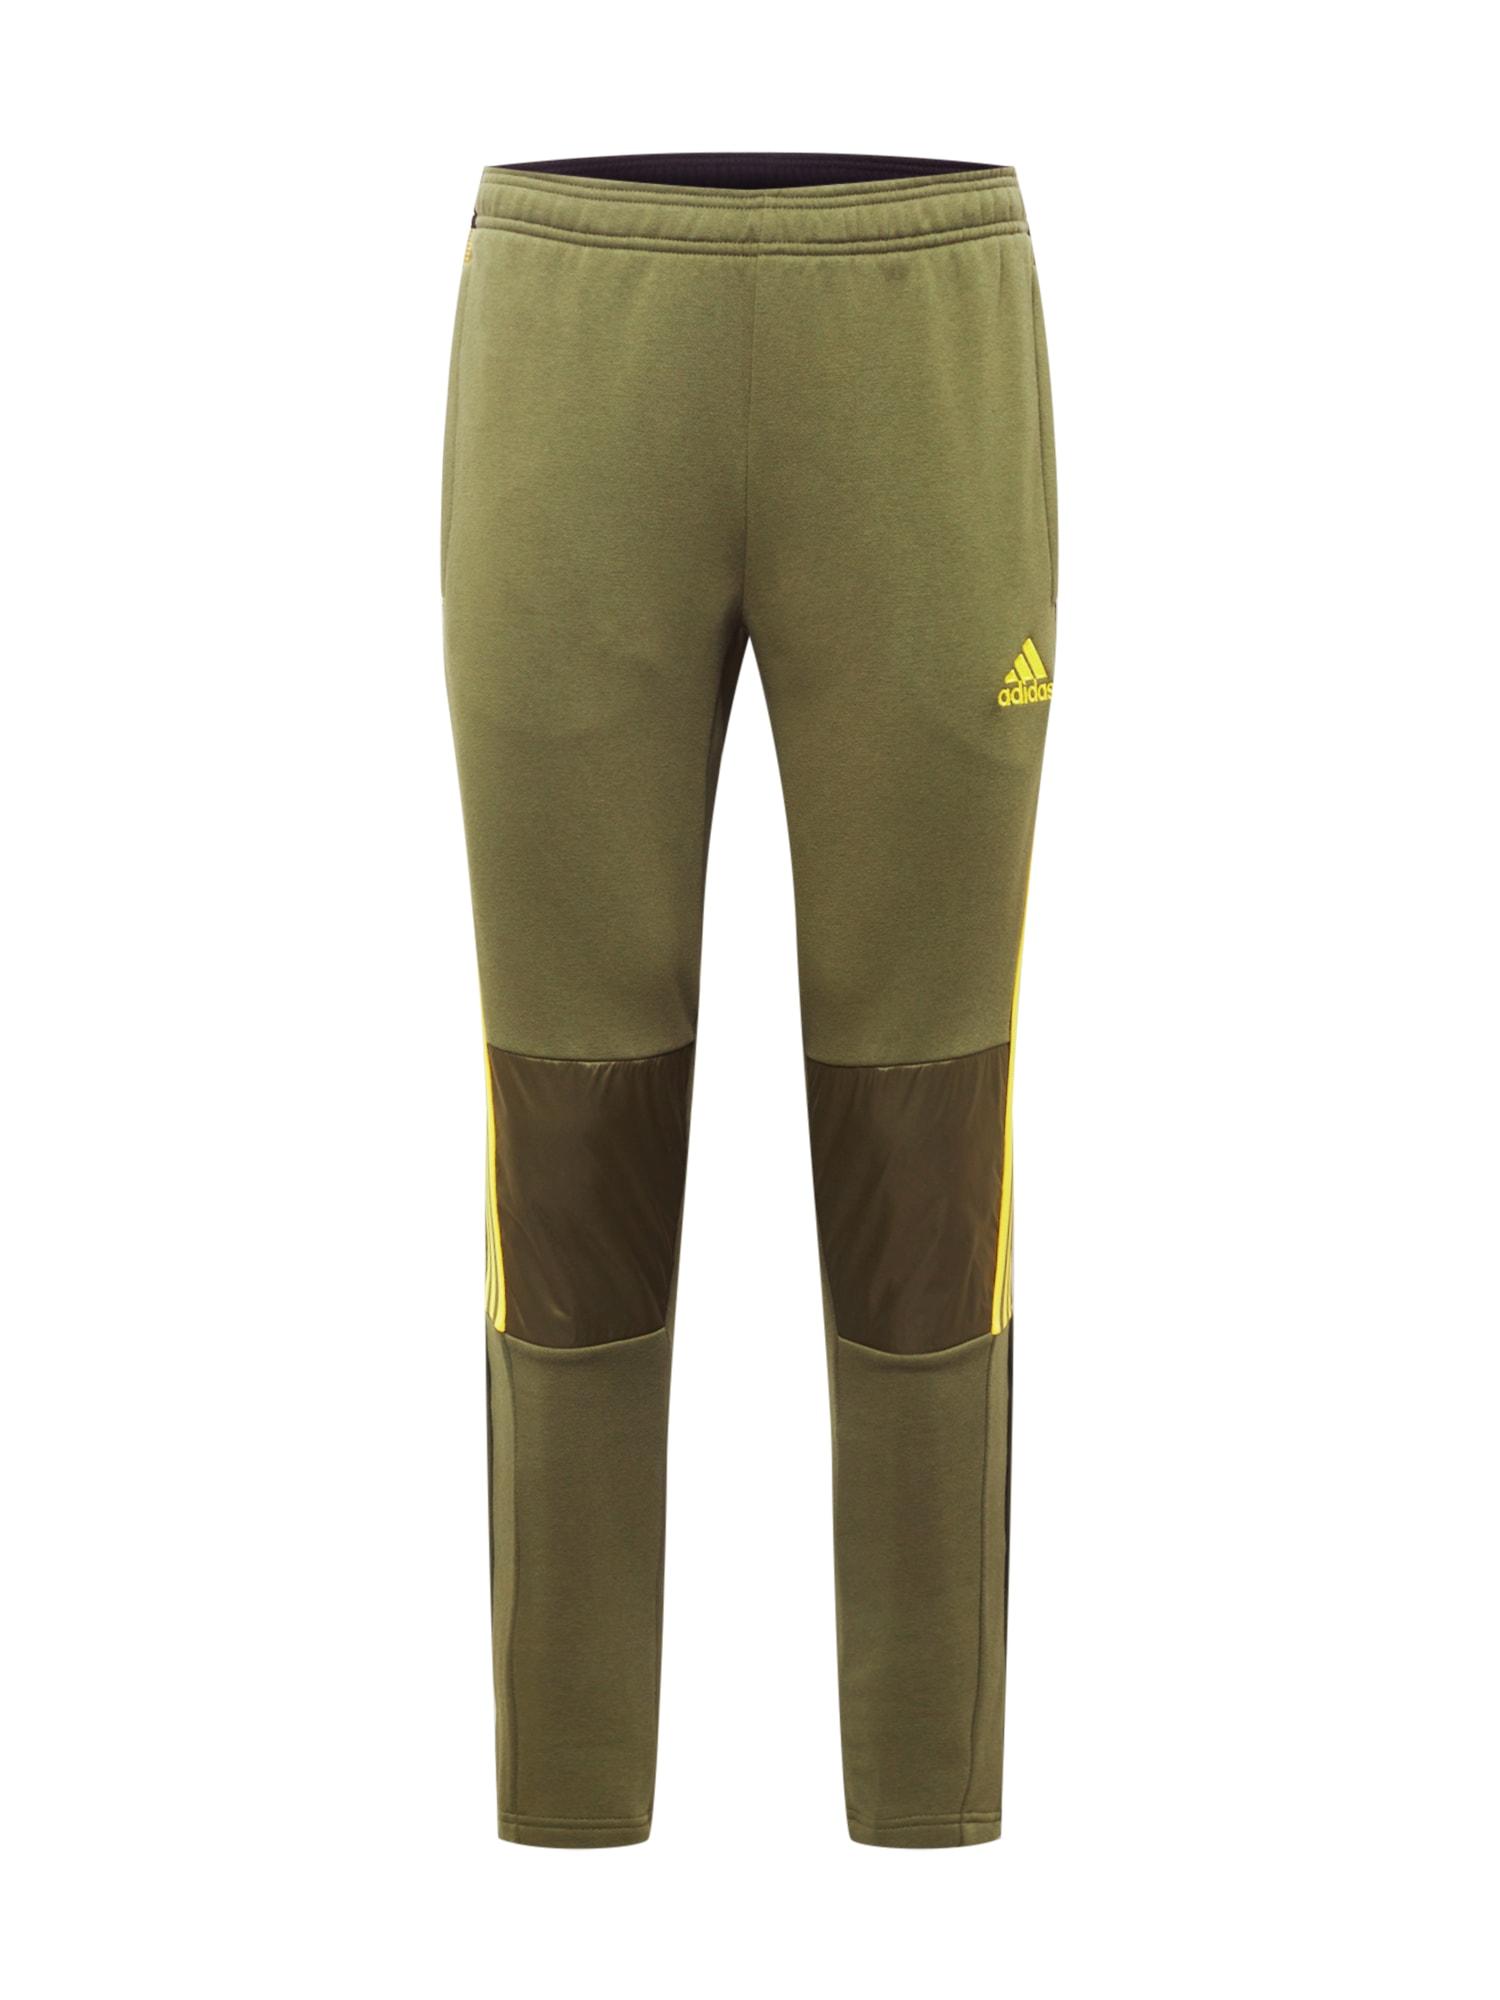 ADIDAS PERFORMANCE Sportovní kalhoty 'Tiro'  khaki / zlatě žlutá